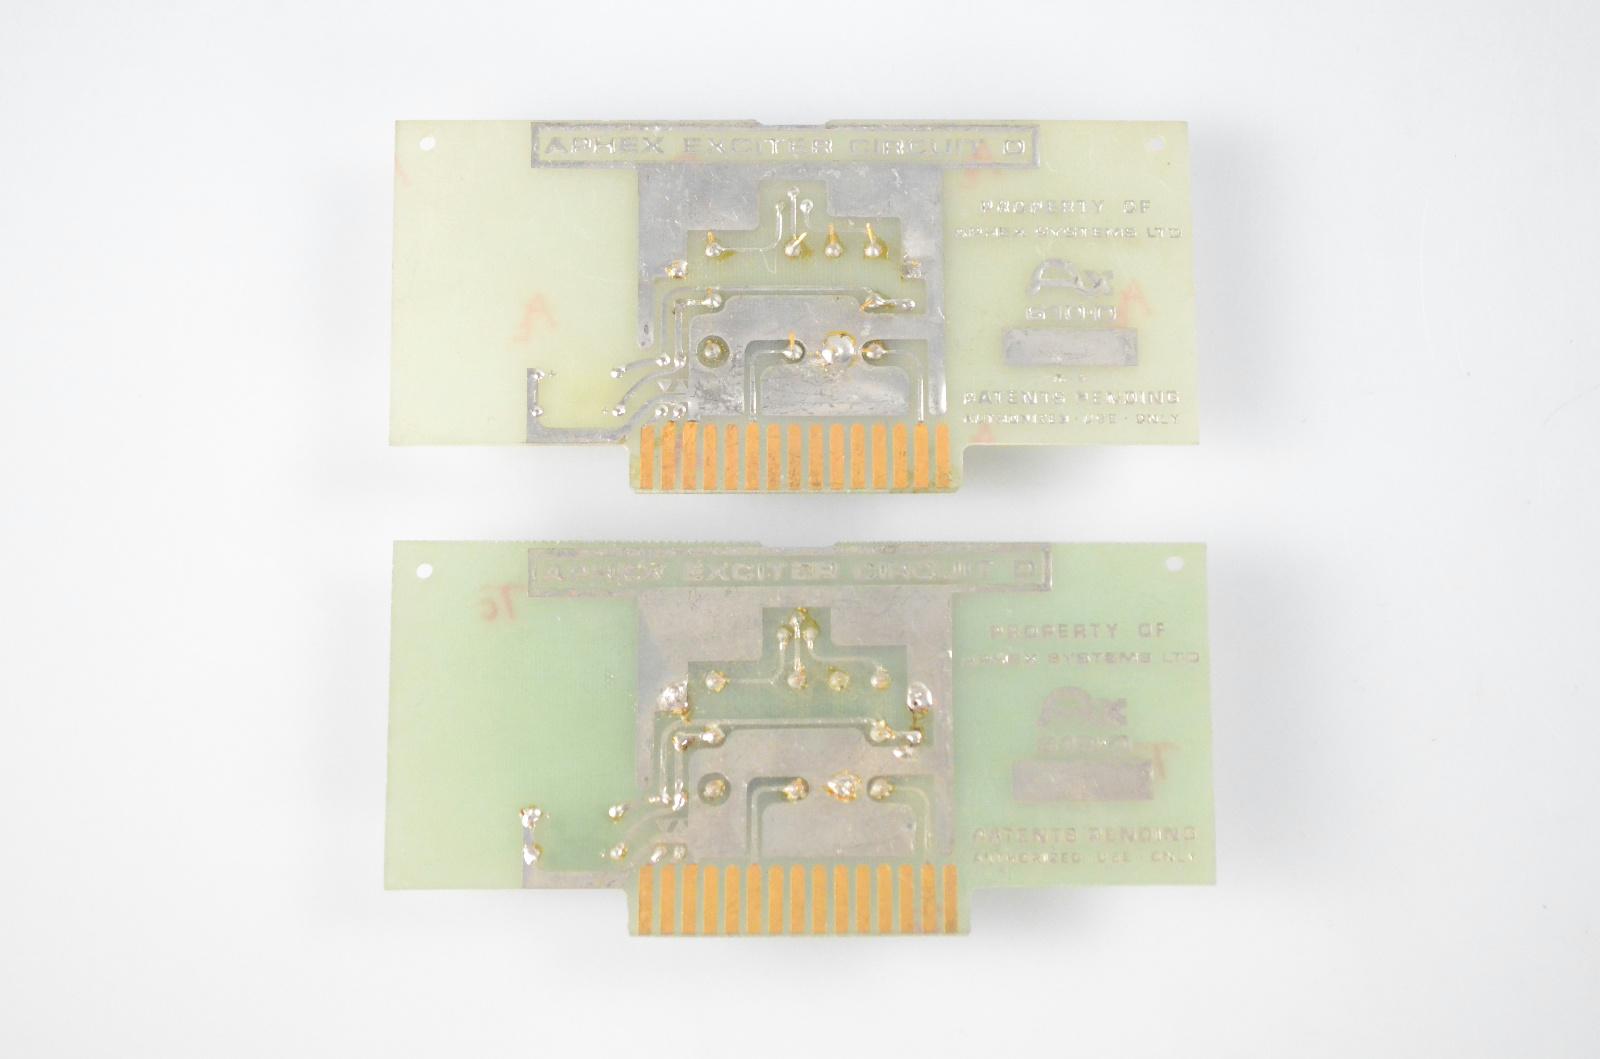 2 Aphex AX 610D Circuit D Boards for Vintage Aural Exciter 402 602 602B #32635